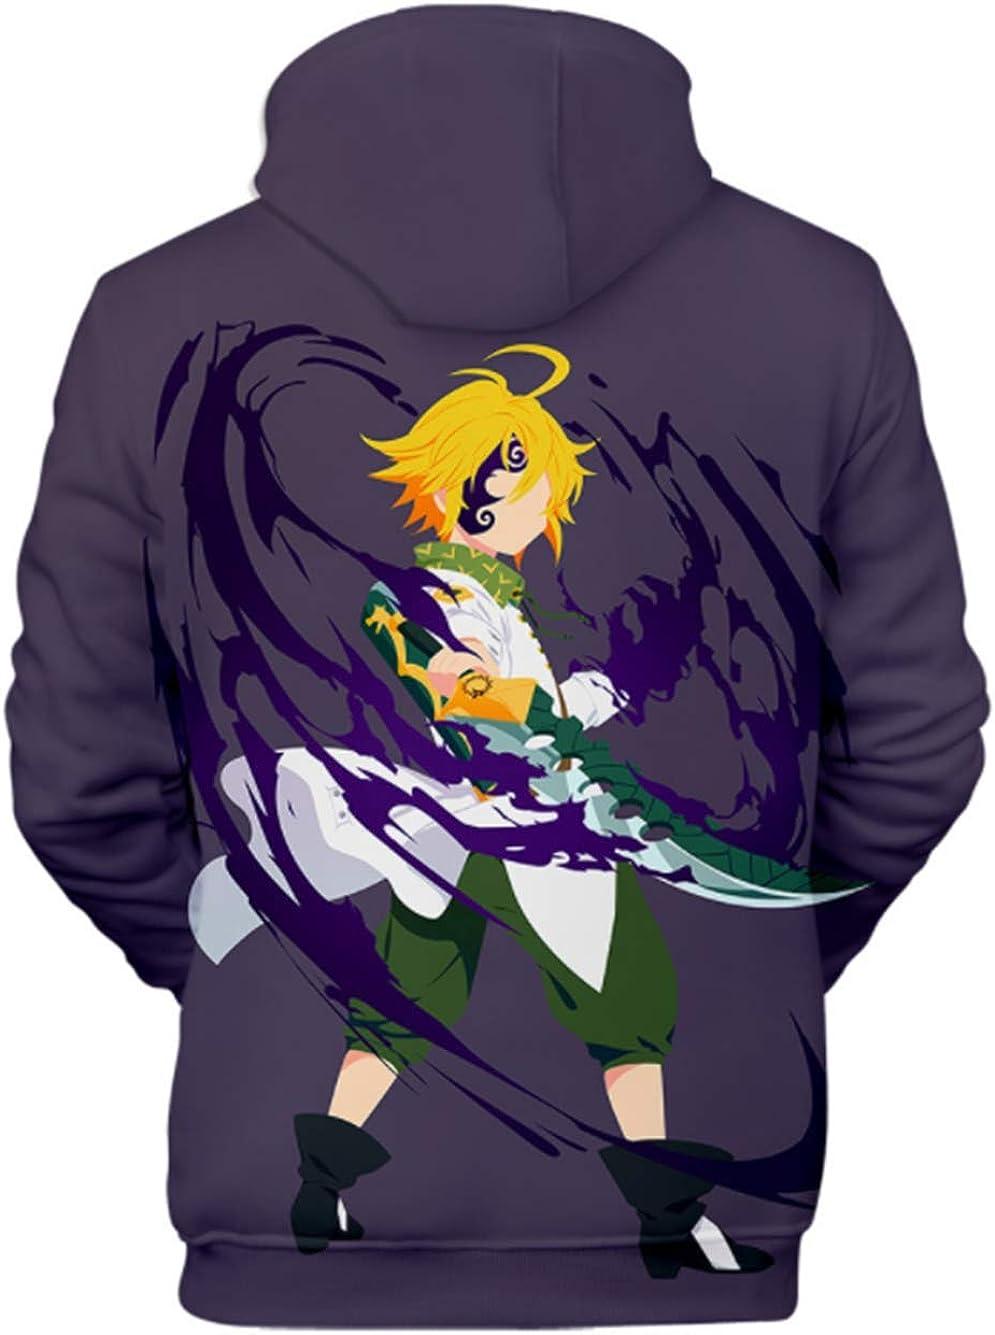 Cosstars Anime Nanatsu No Taizai The Seven Deadly Sins Hoodie Sudadera con Capucha Cosplay Disfraz 3D Impreso Pullover Su/éter con Bolsillos Cord/ón